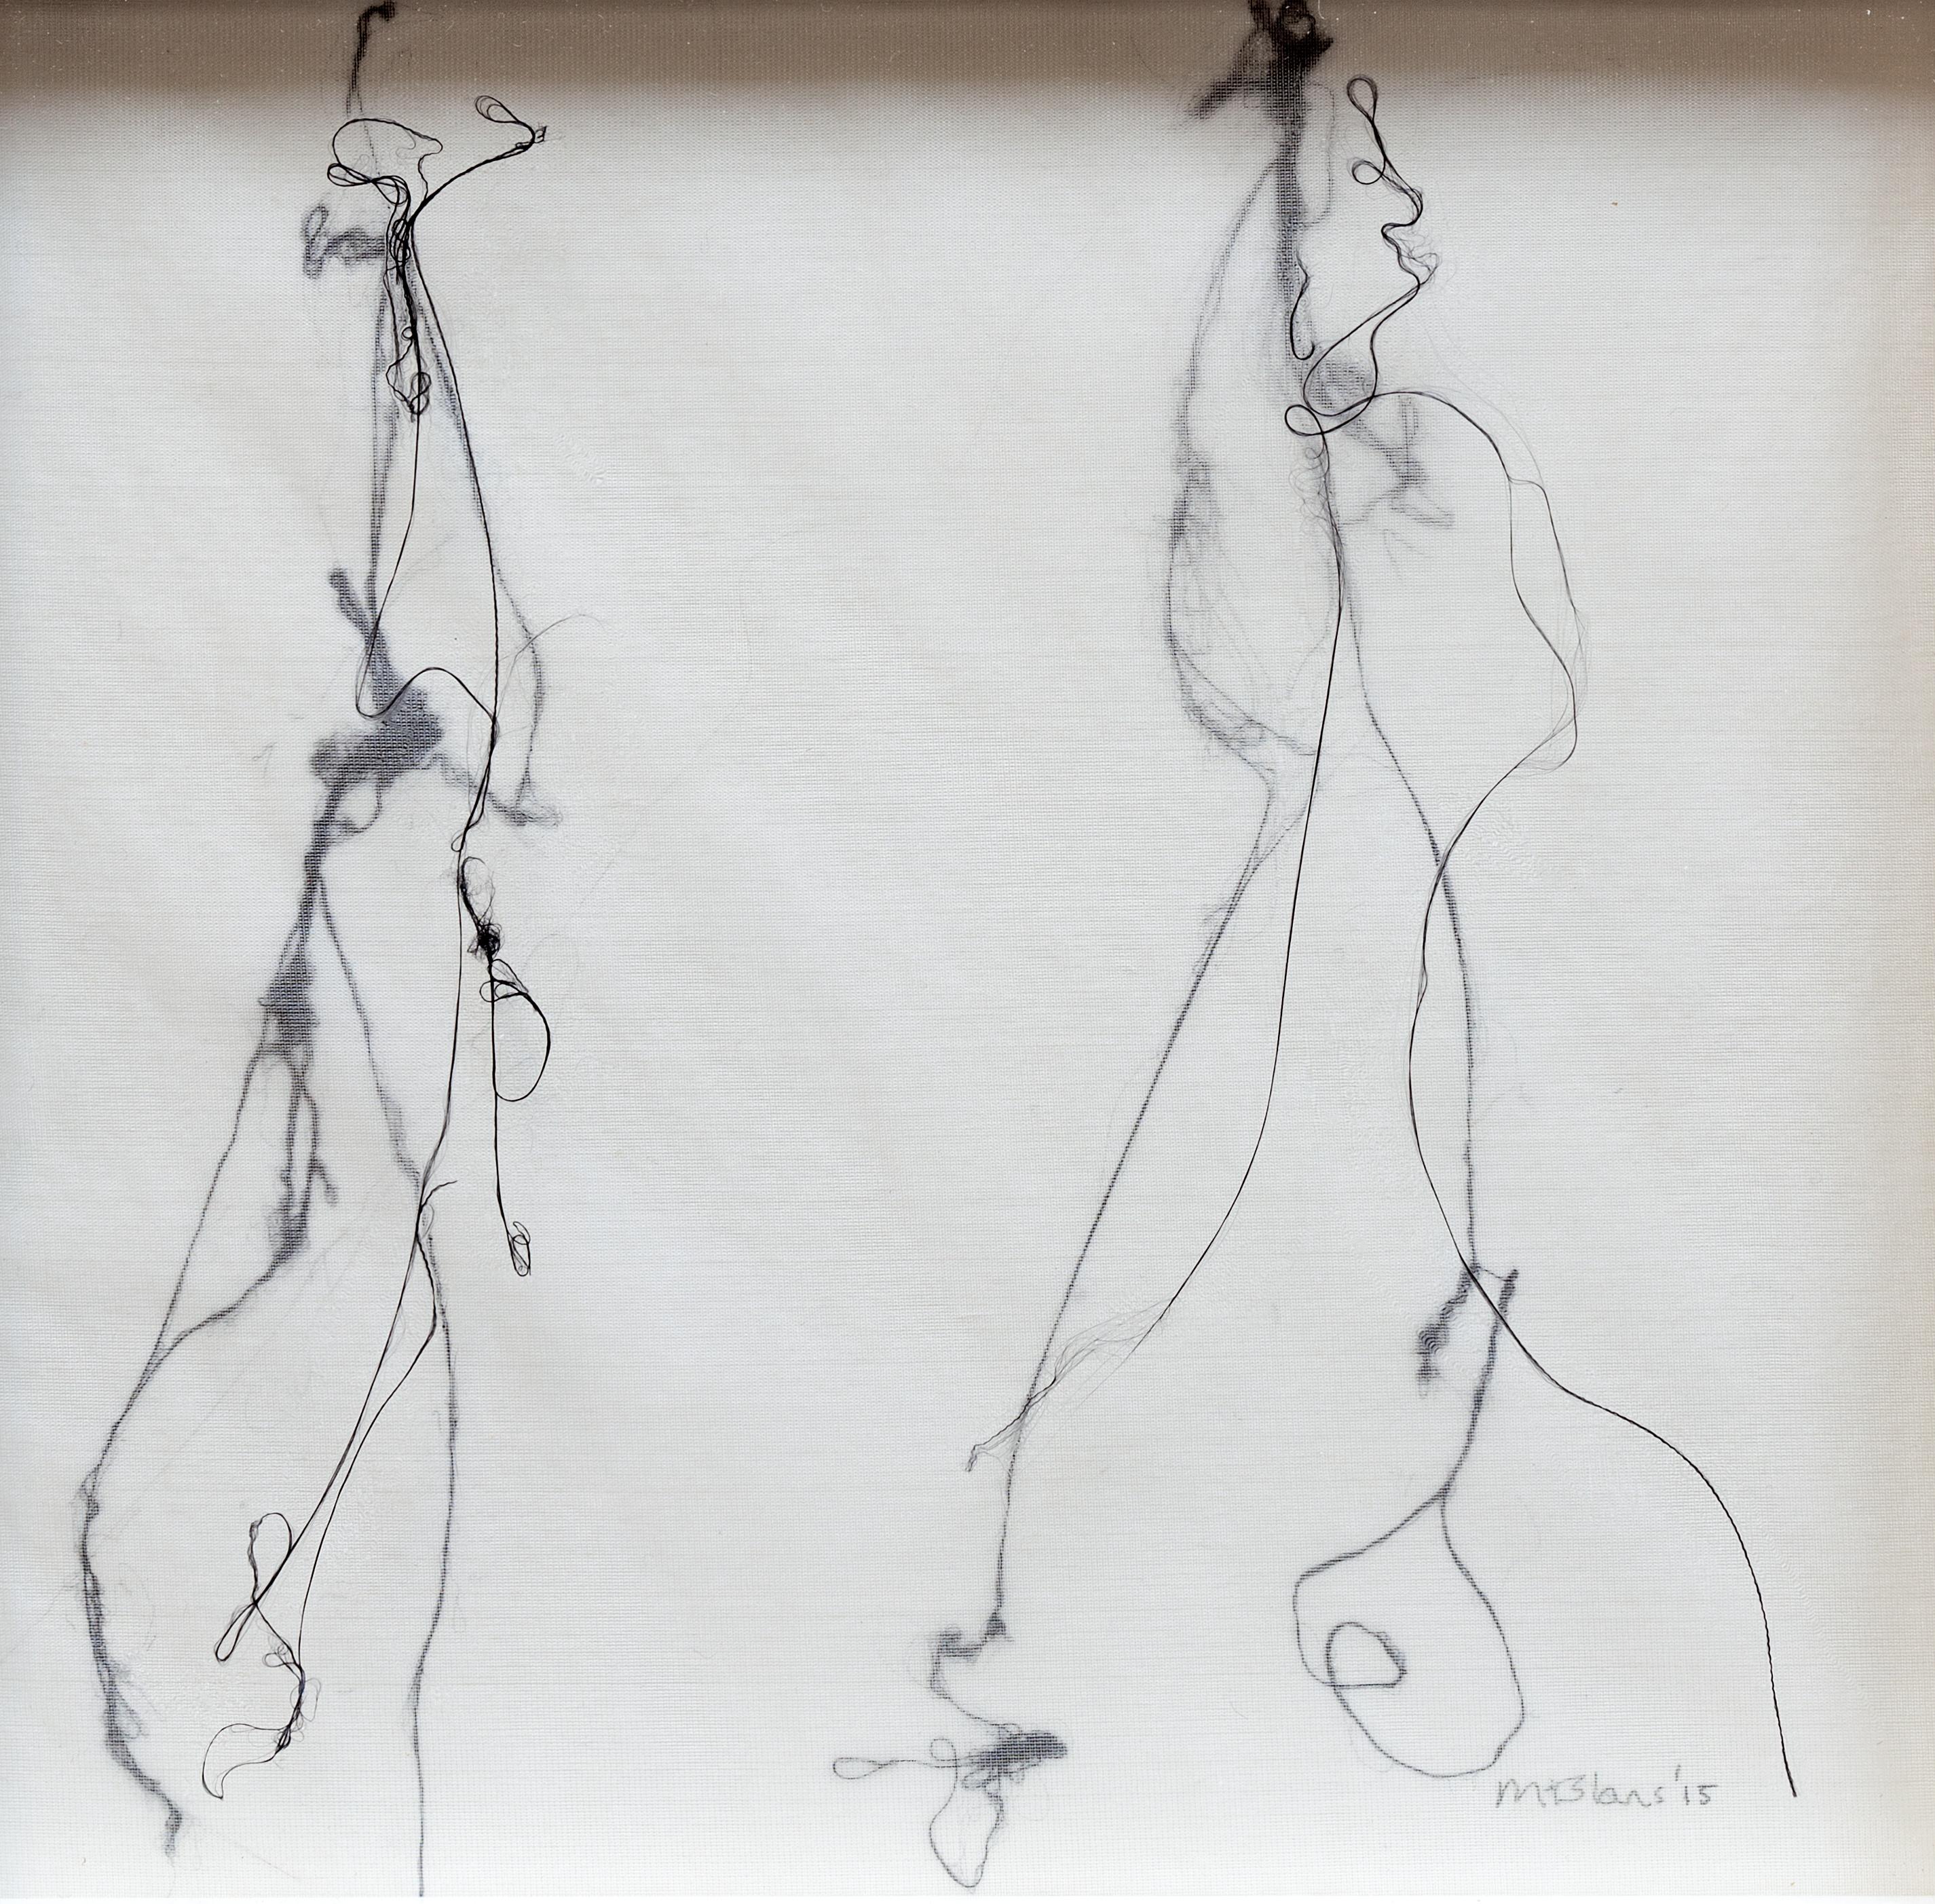 Dancing_Figures_gemengde_techniek_Maartj